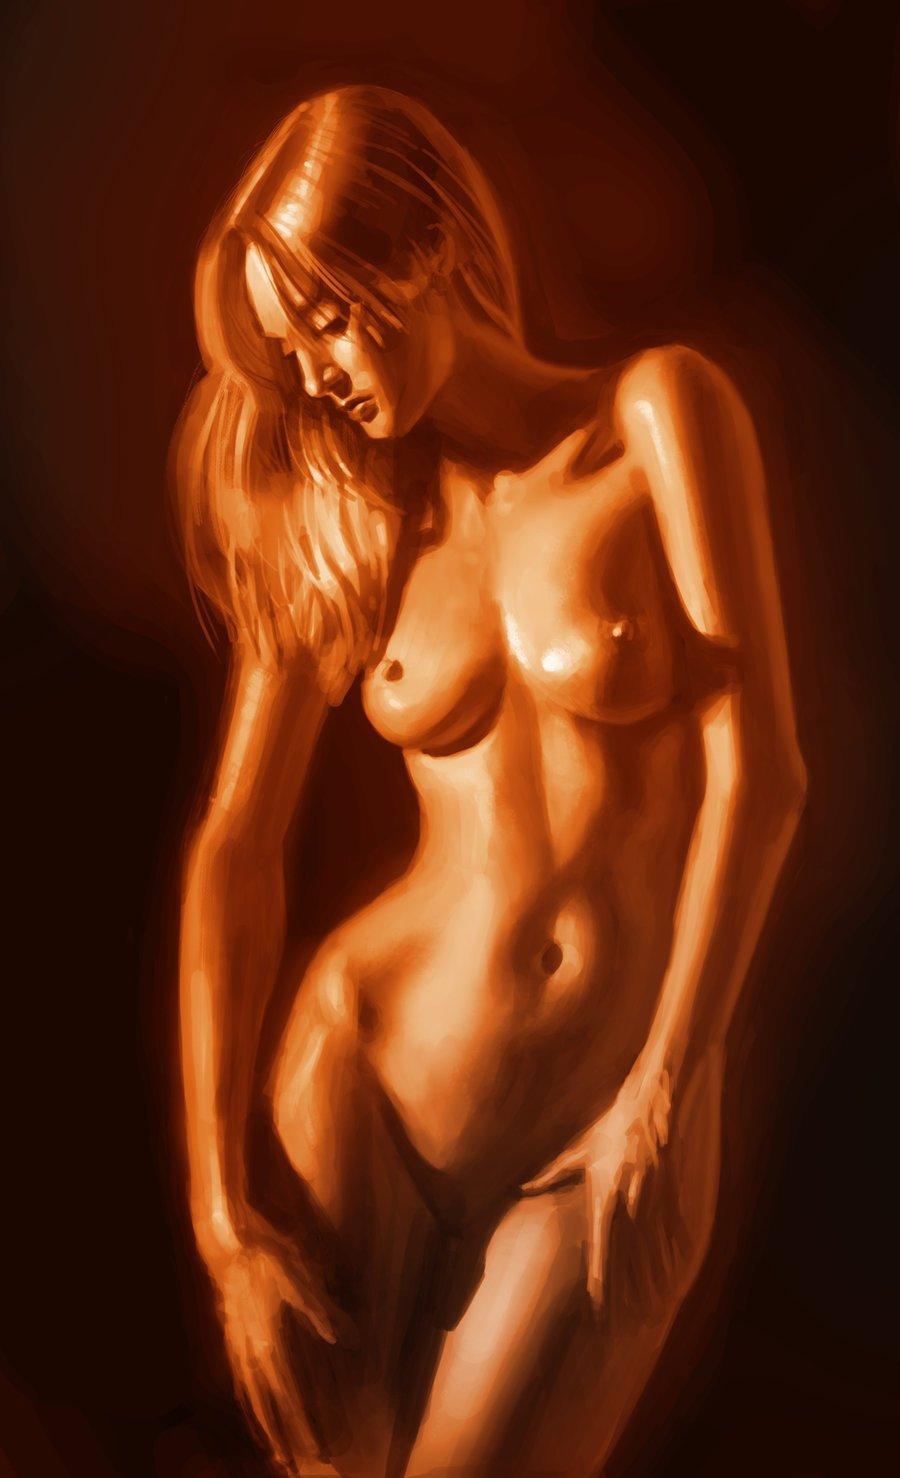 Naked Old Man Digital Art By Joaquin Abella